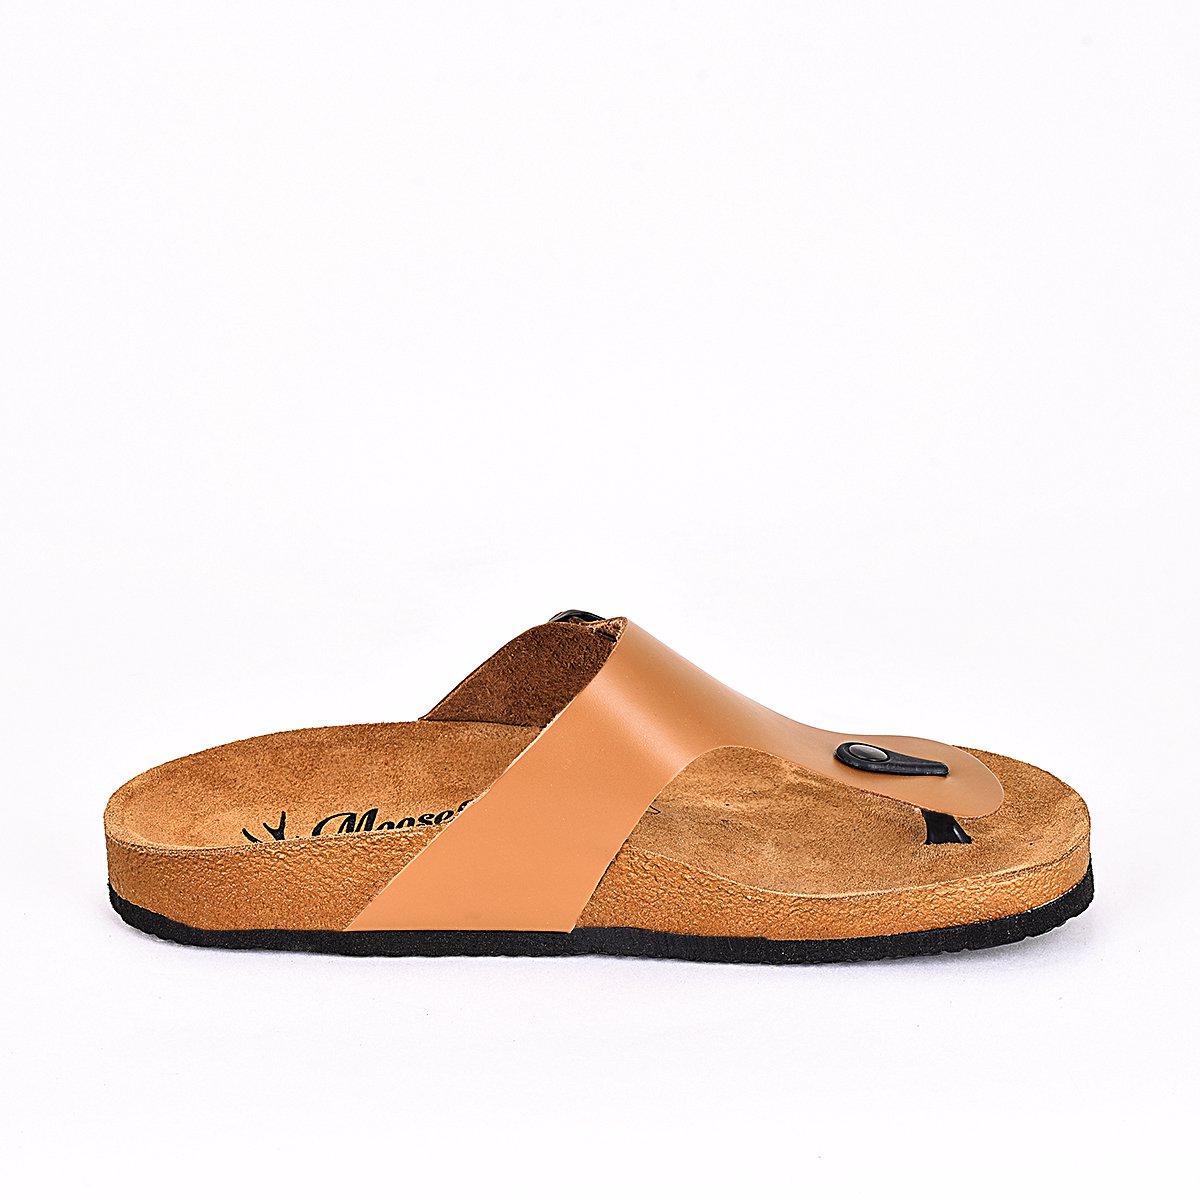 4df575baa06 https://www.ozsale.com.au/product/Balenciaga-Carry ...